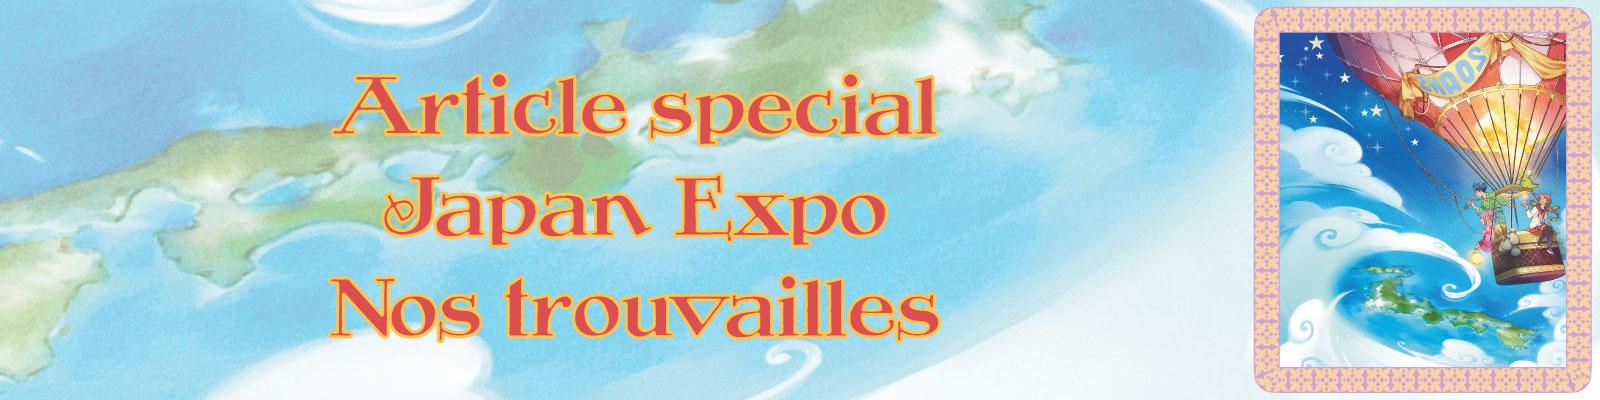 Japan-Expo-nos trouvailles